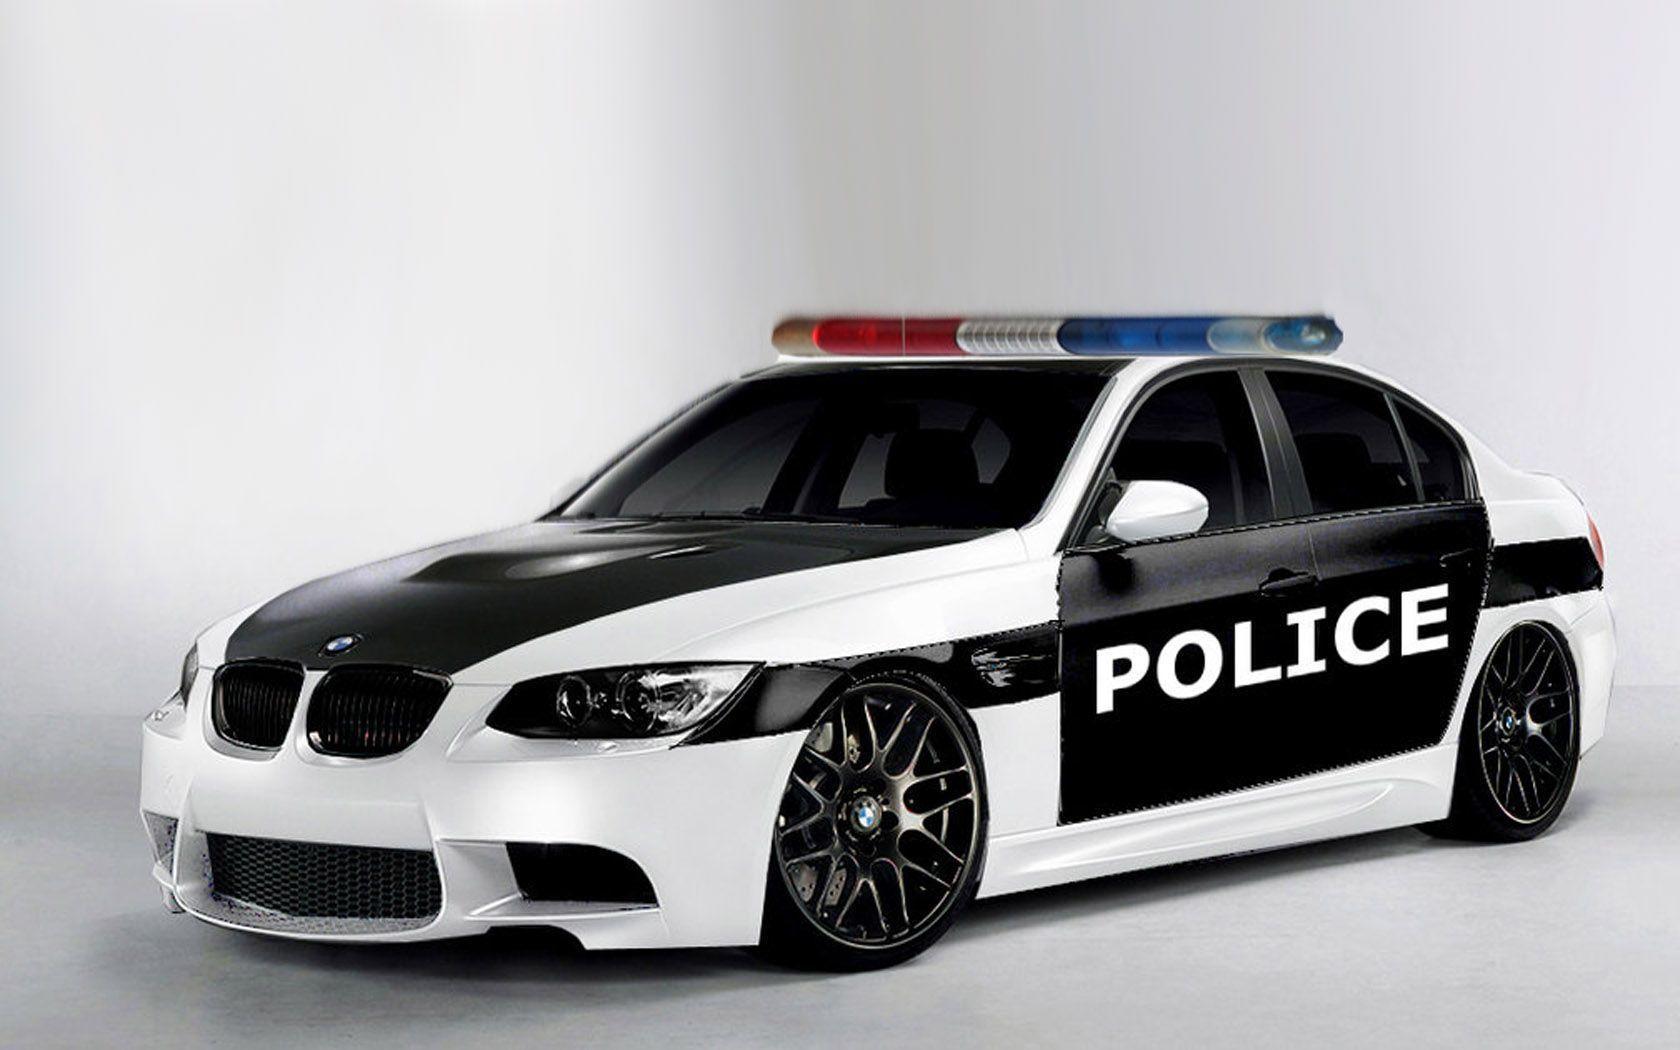 3d Mustang Wallpaper Police Car Wallpapers Wallpaper Cave